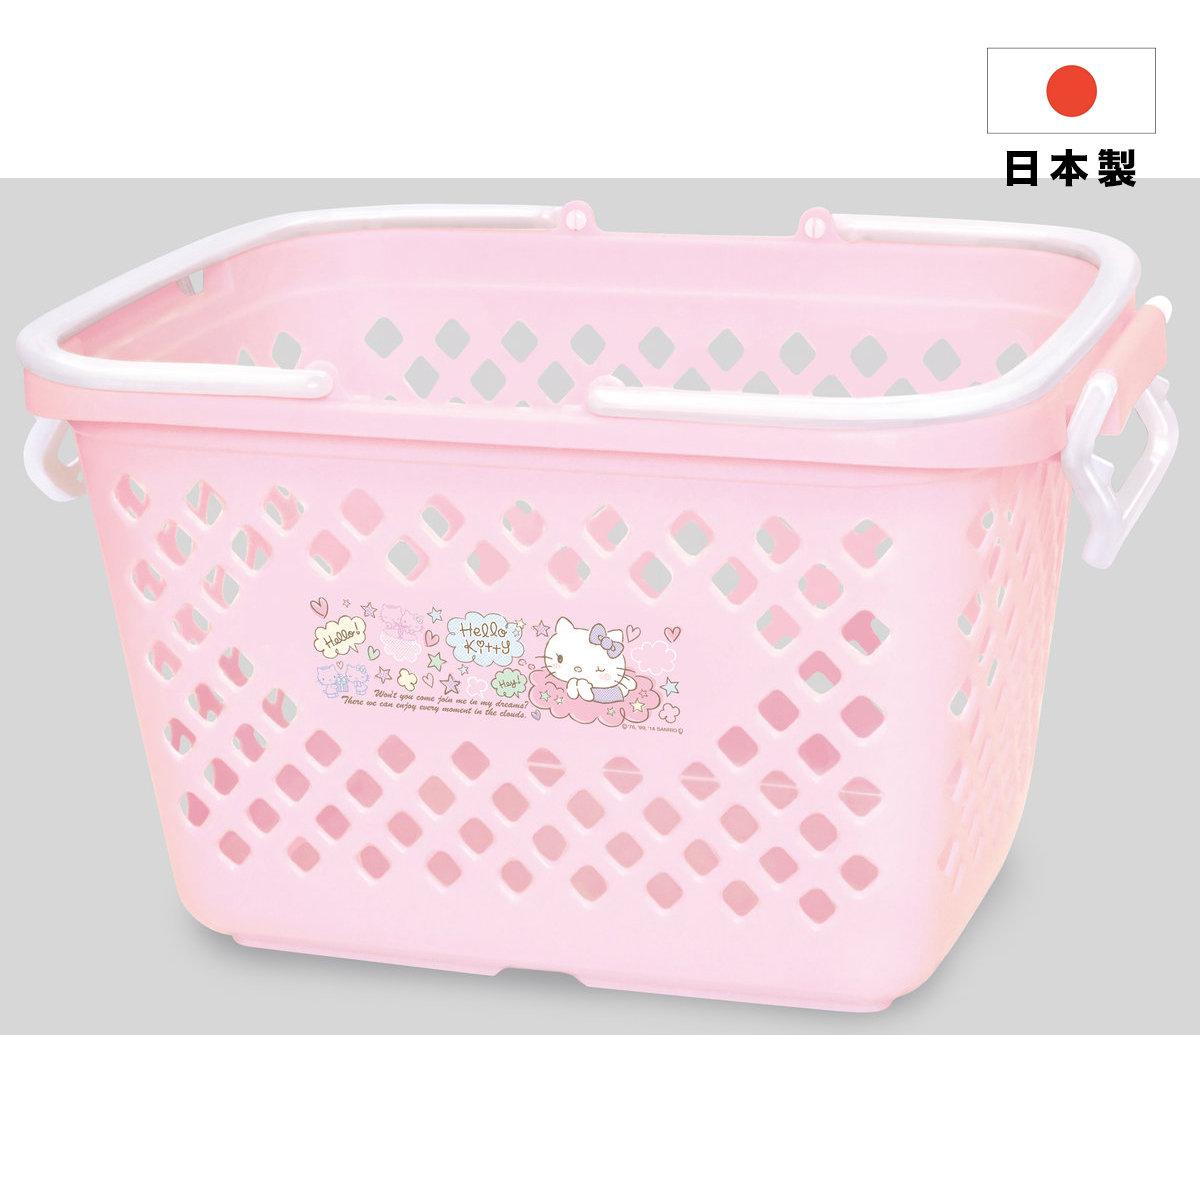 58e7b67e2 Nishiki | HELLO KITTY Foldable Small Clothes Basket | HKTVmall Online  Shopping